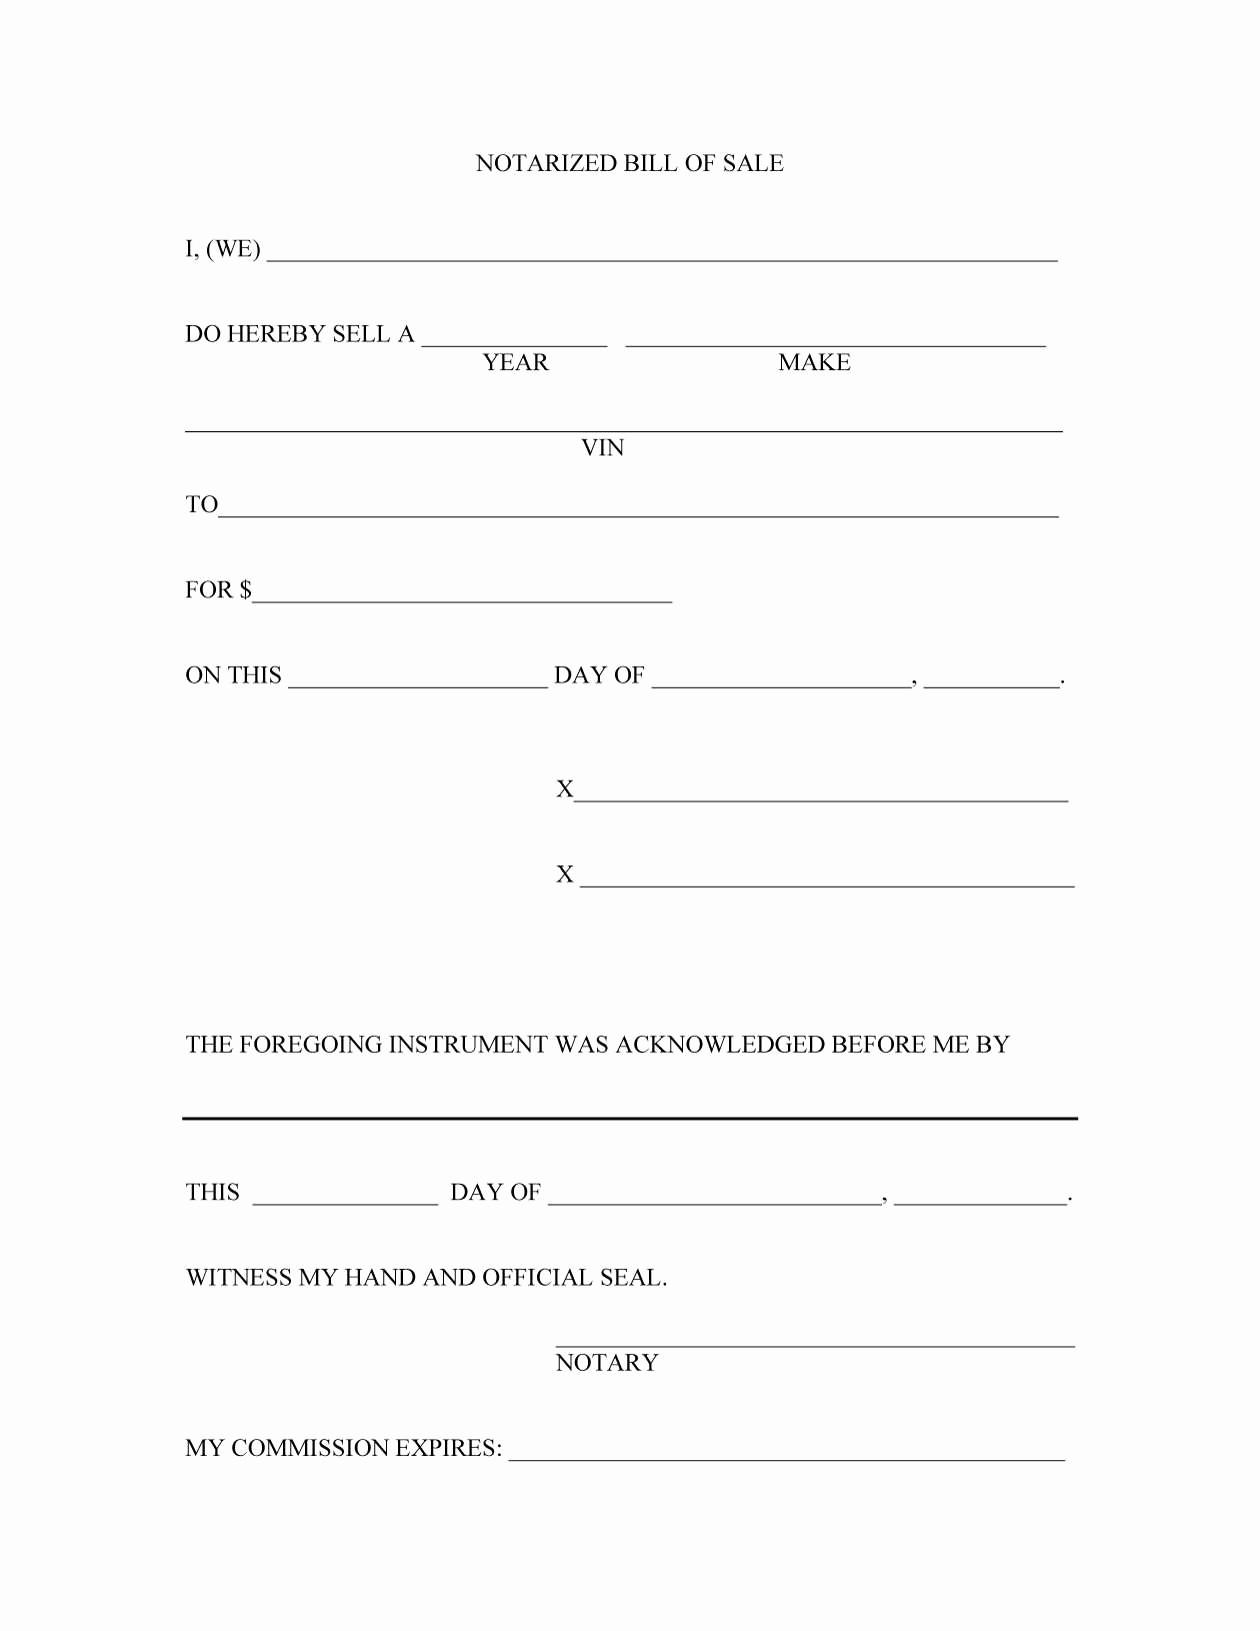 Free Downloadable Bill Of Sale Elegant 45 Fee Printable Bill Of Sale Templates Car Boat Gun